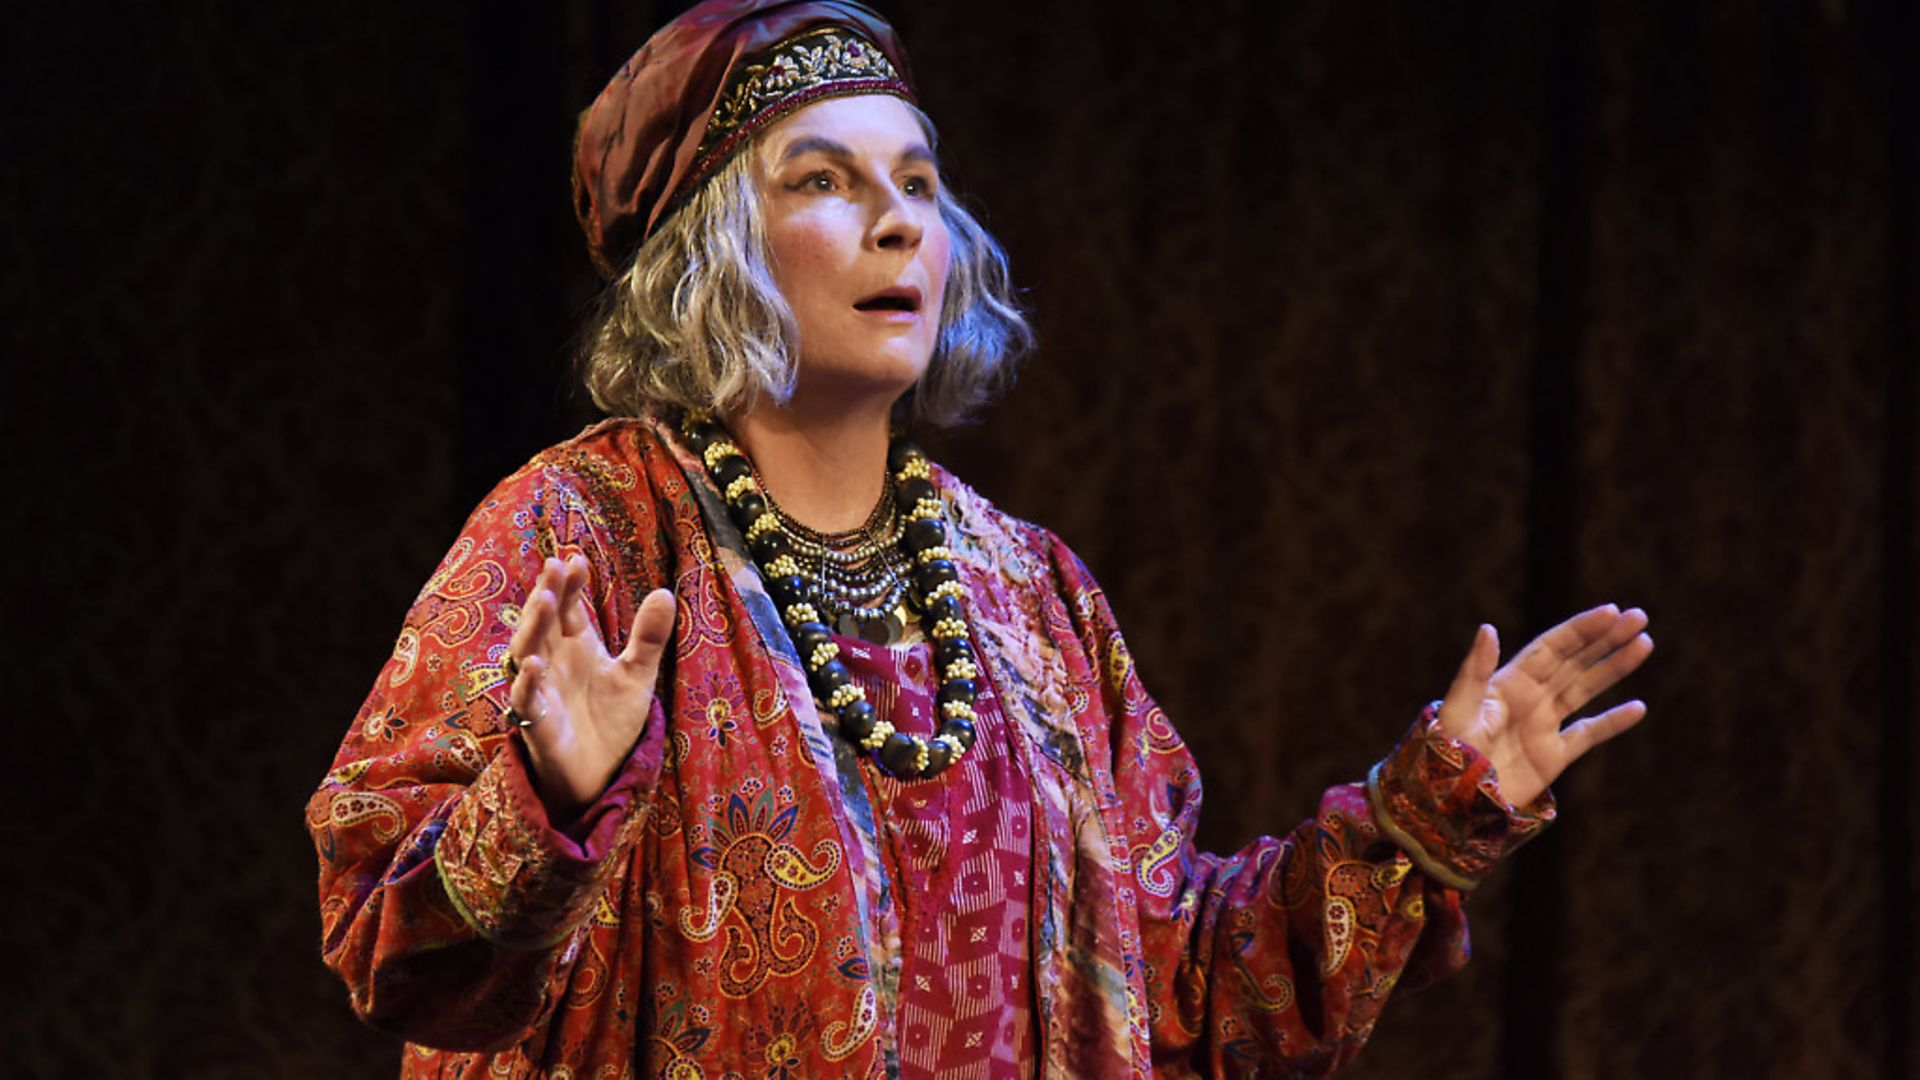 Jennifer Saunders as Madame Arcati in Blithe Spirit. Credit: Nobby Clark. - Credit: Photograph by Nobby Clark